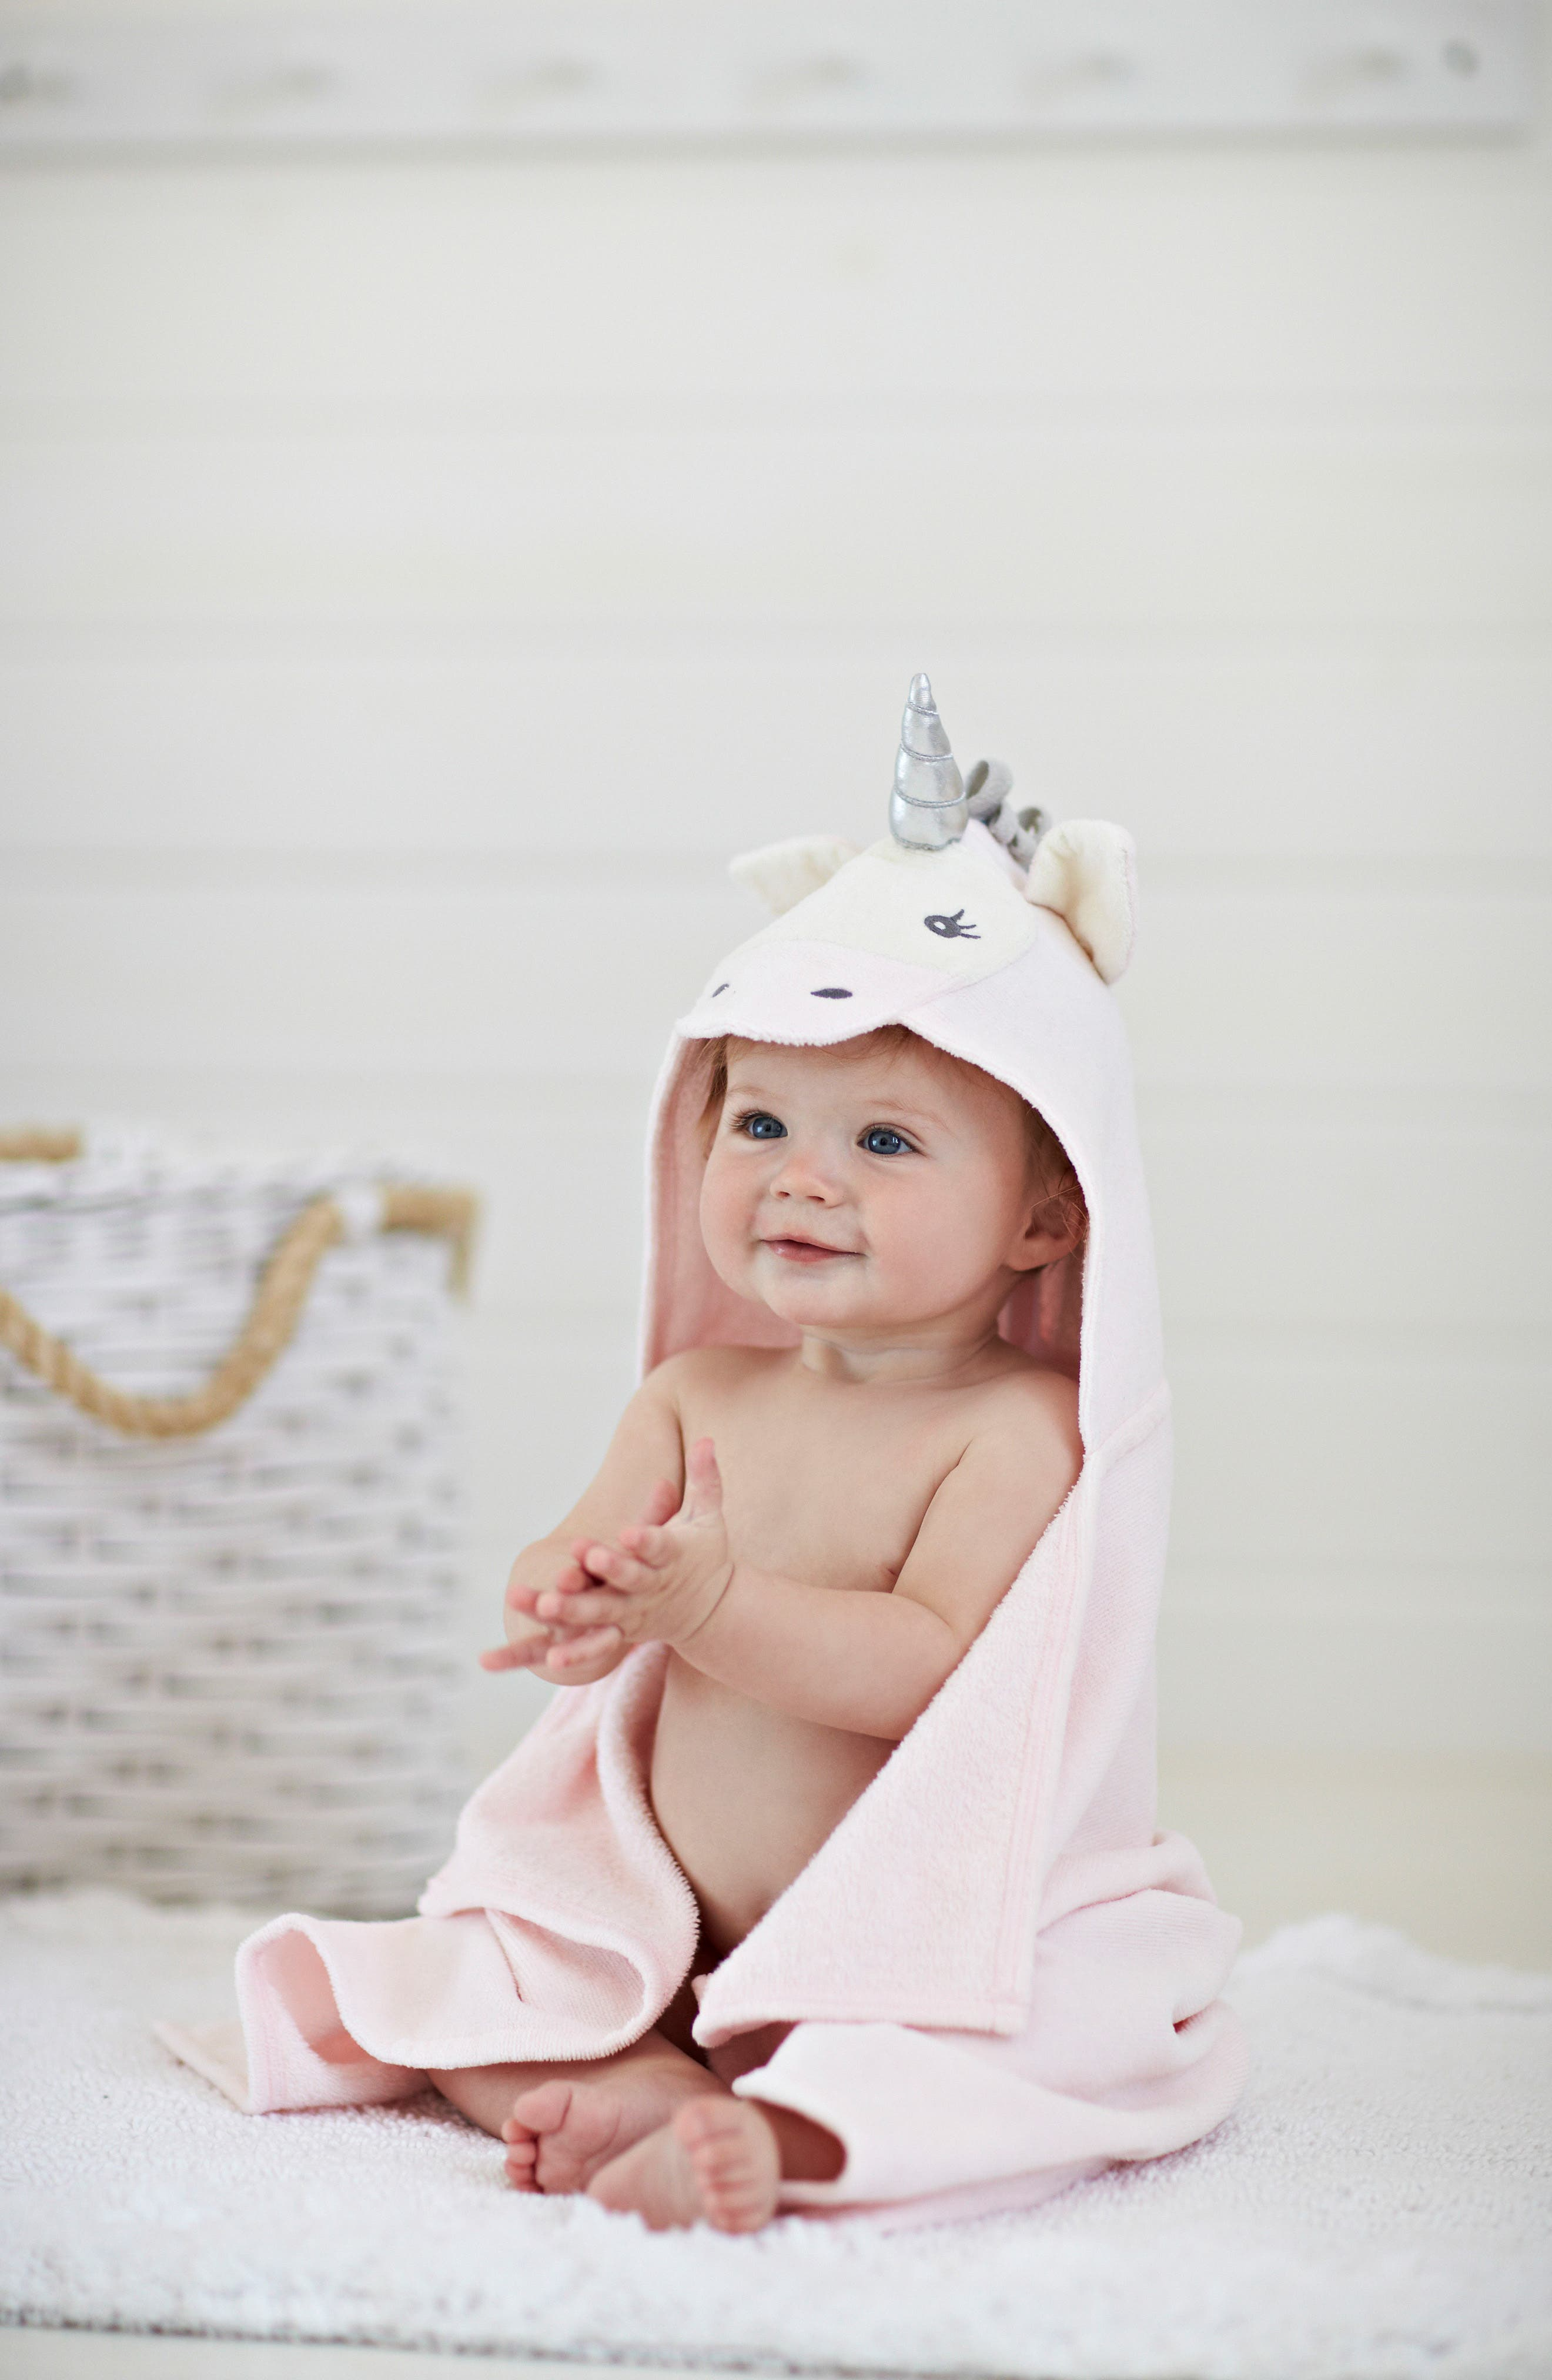 Terry Velour Hooded Unicorn Towel,                             Alternate thumbnail 4, color,                             UNICORN